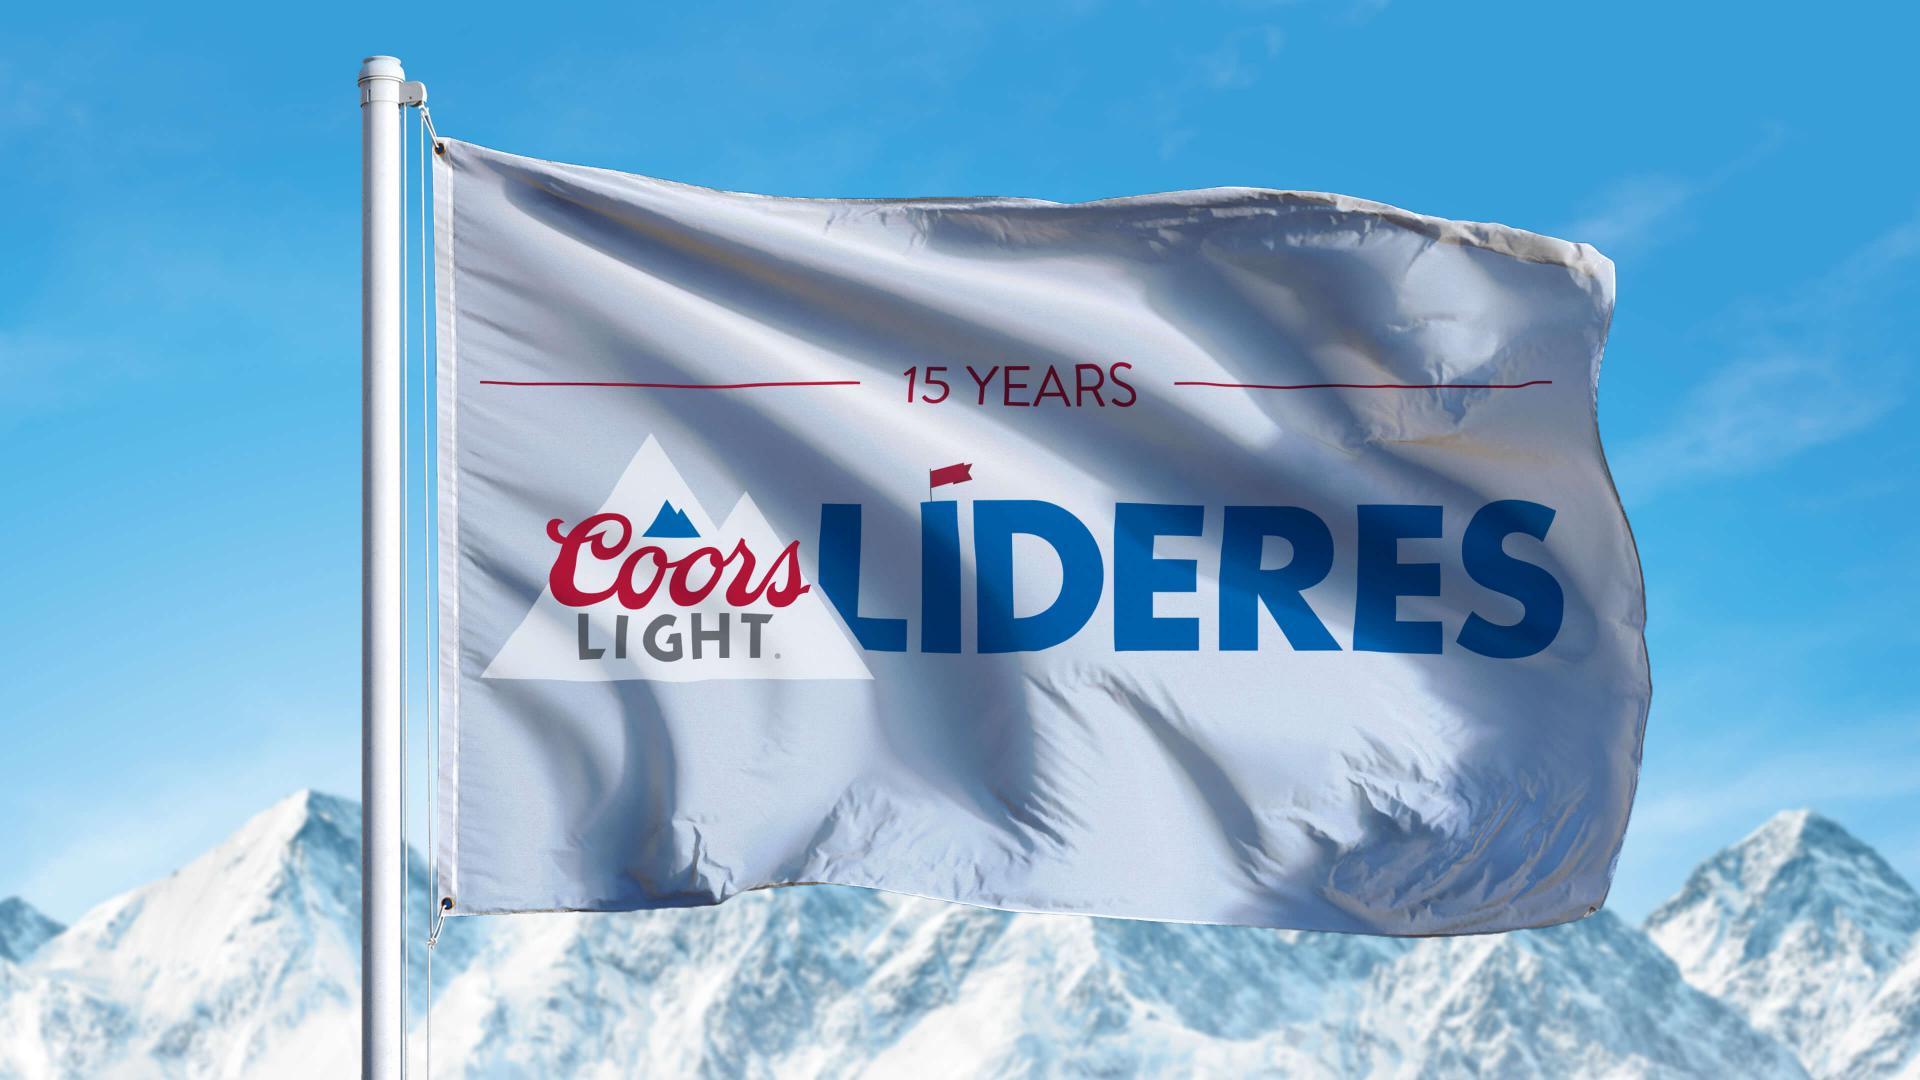 Coors Light Lideres Flag